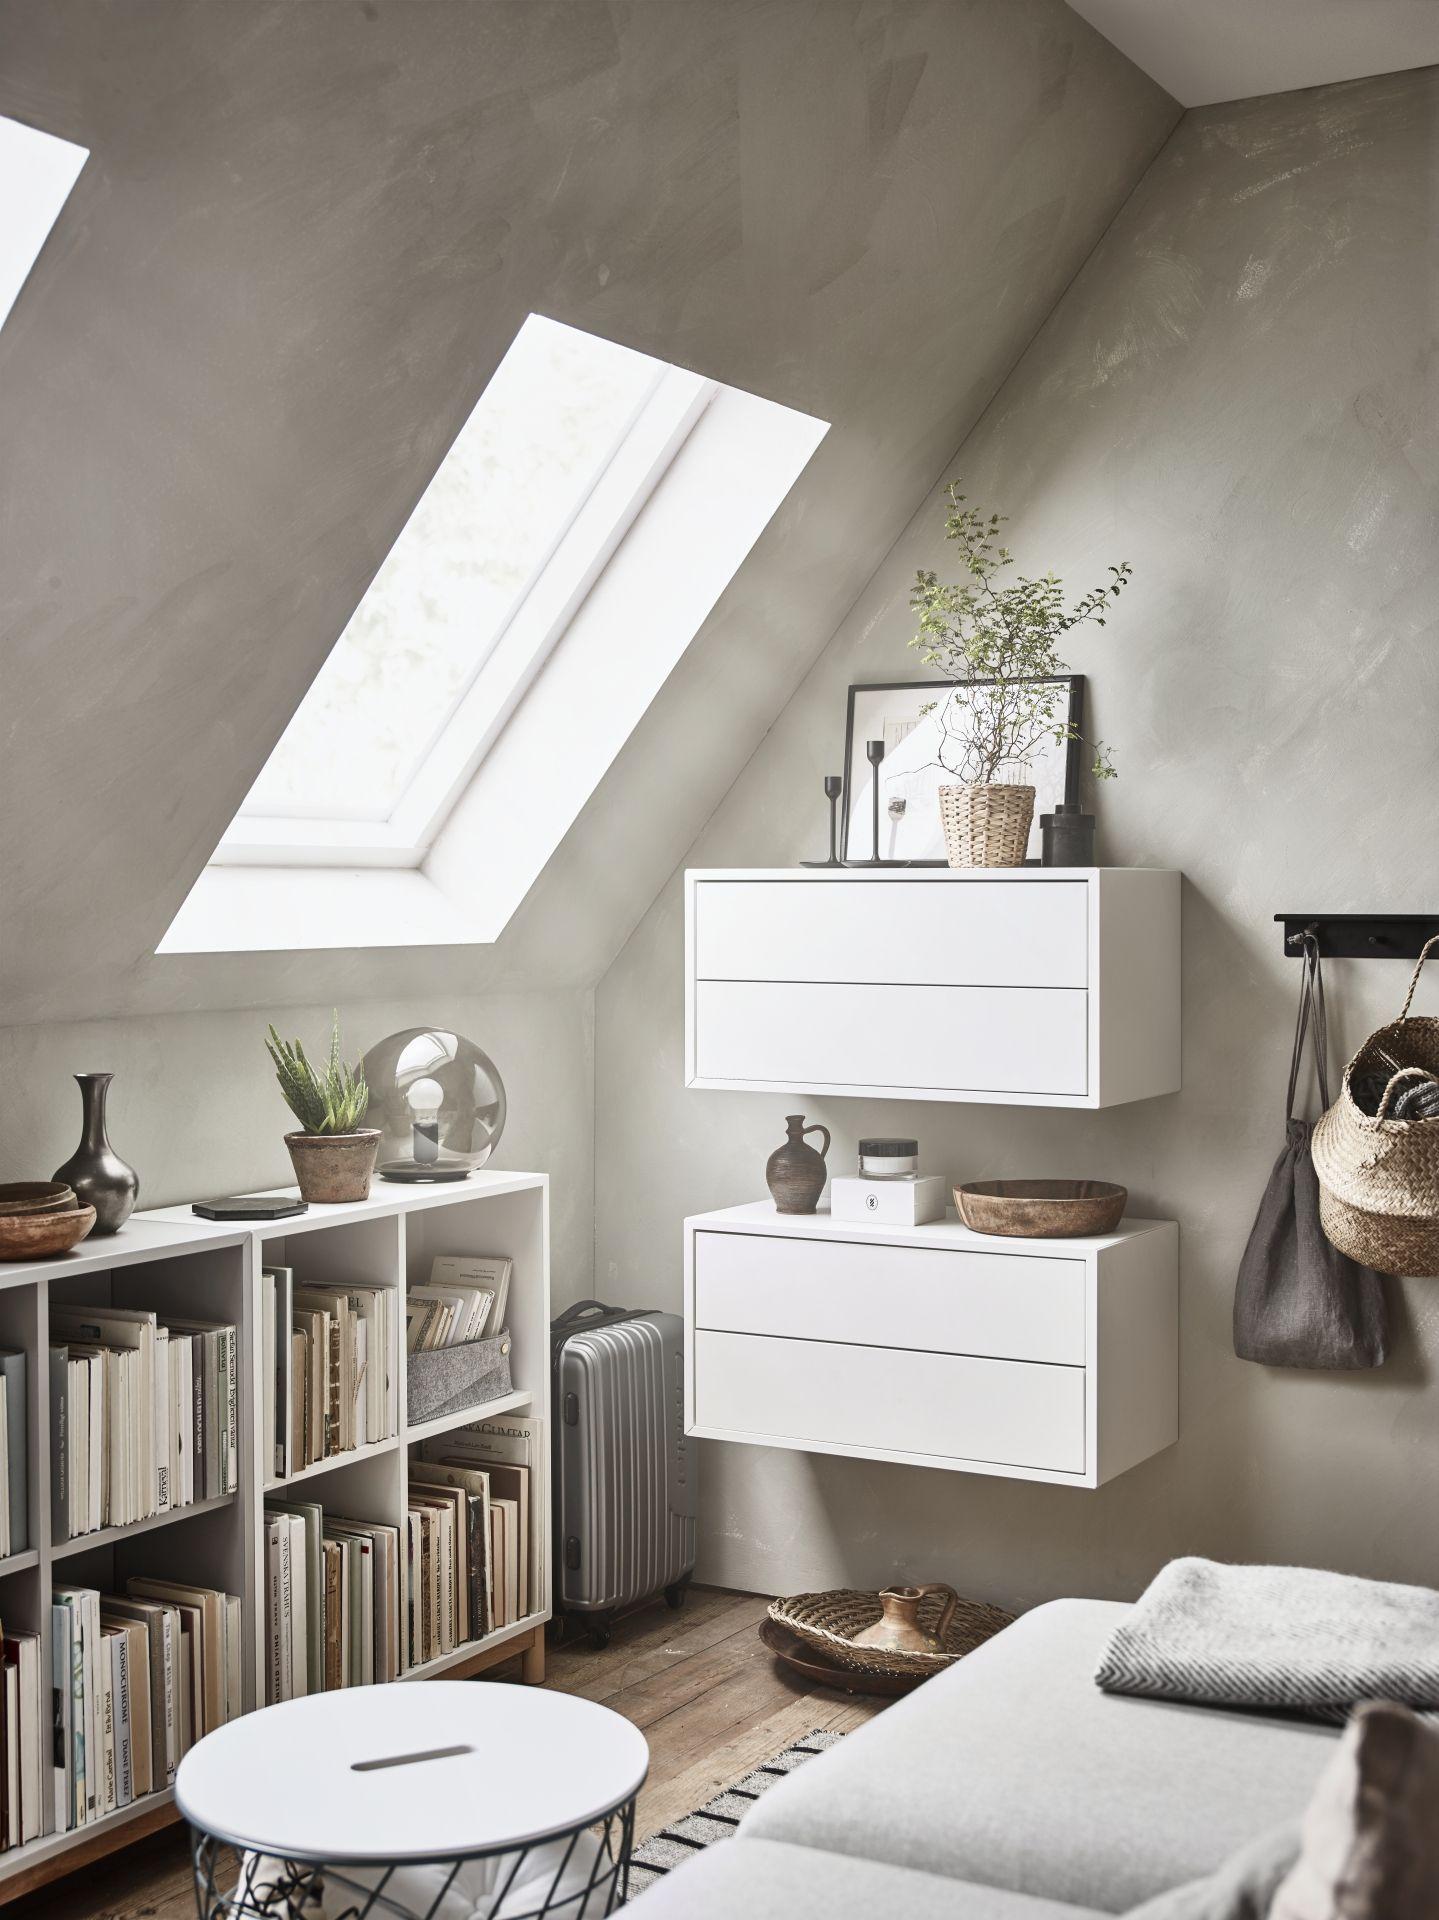 Badezimmer ideen 10x12 risultati immagini per eket idee  décor in   bedroom room